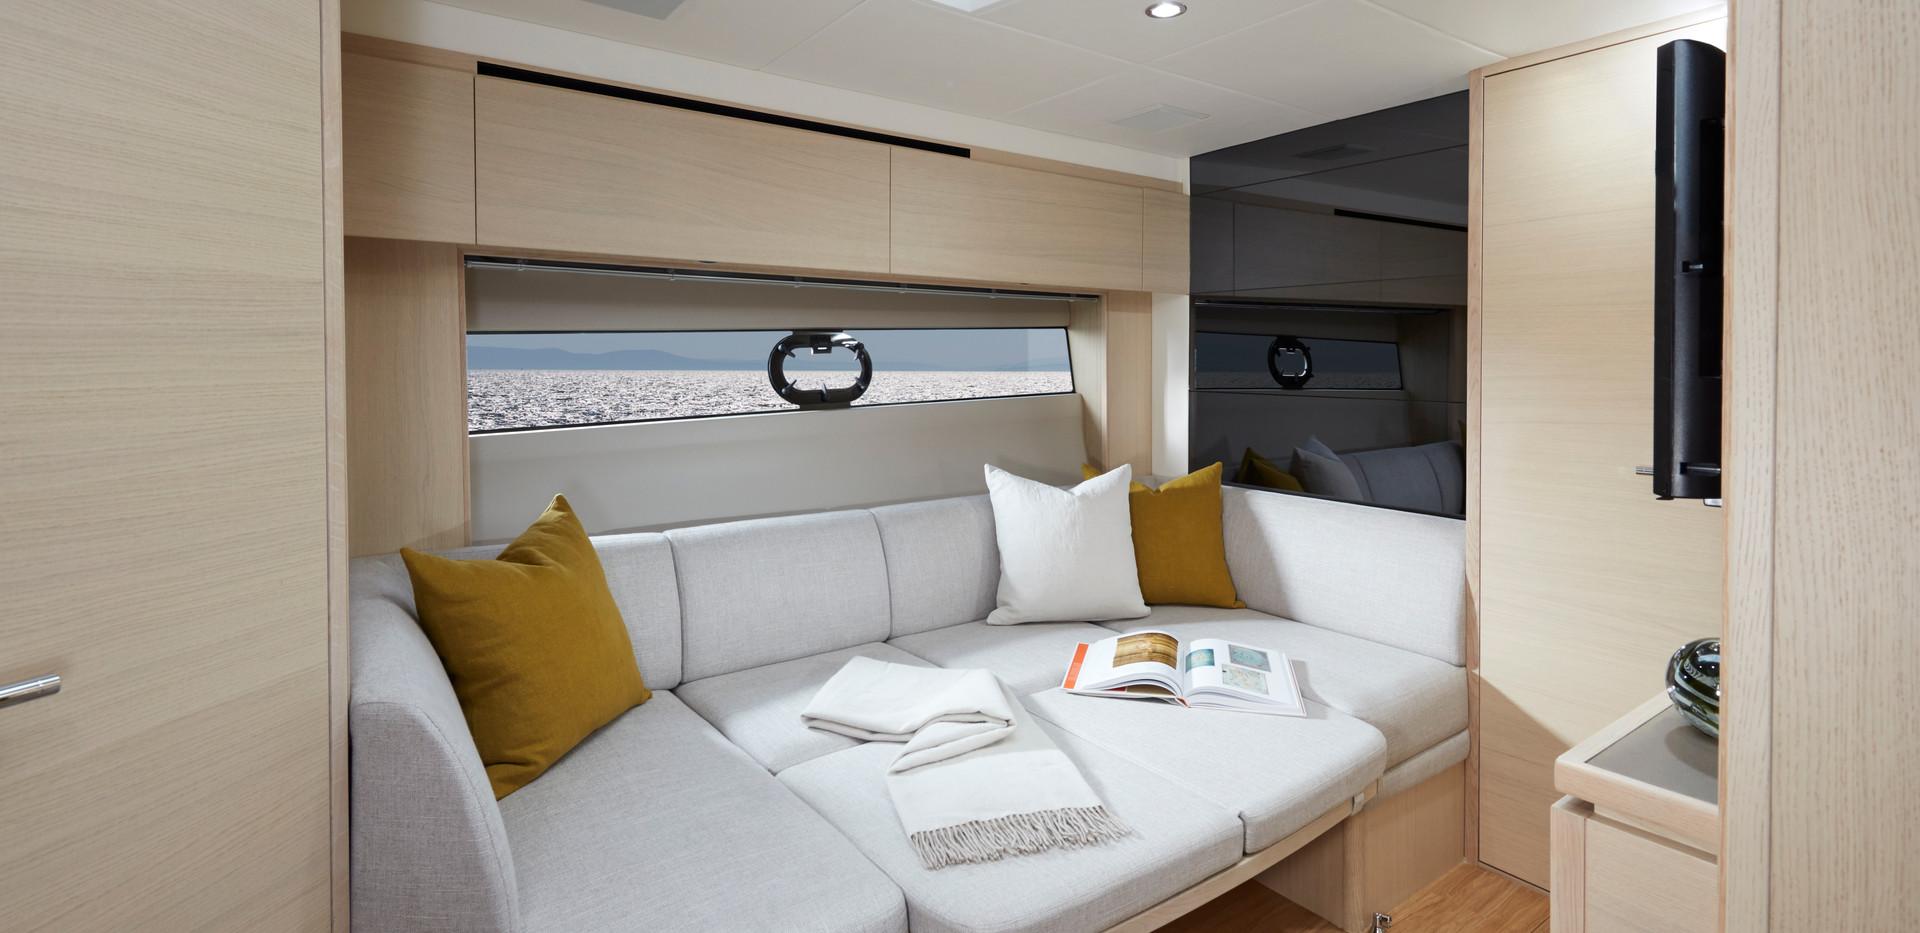 v40-interior-saloon-sofa-conversion-alba